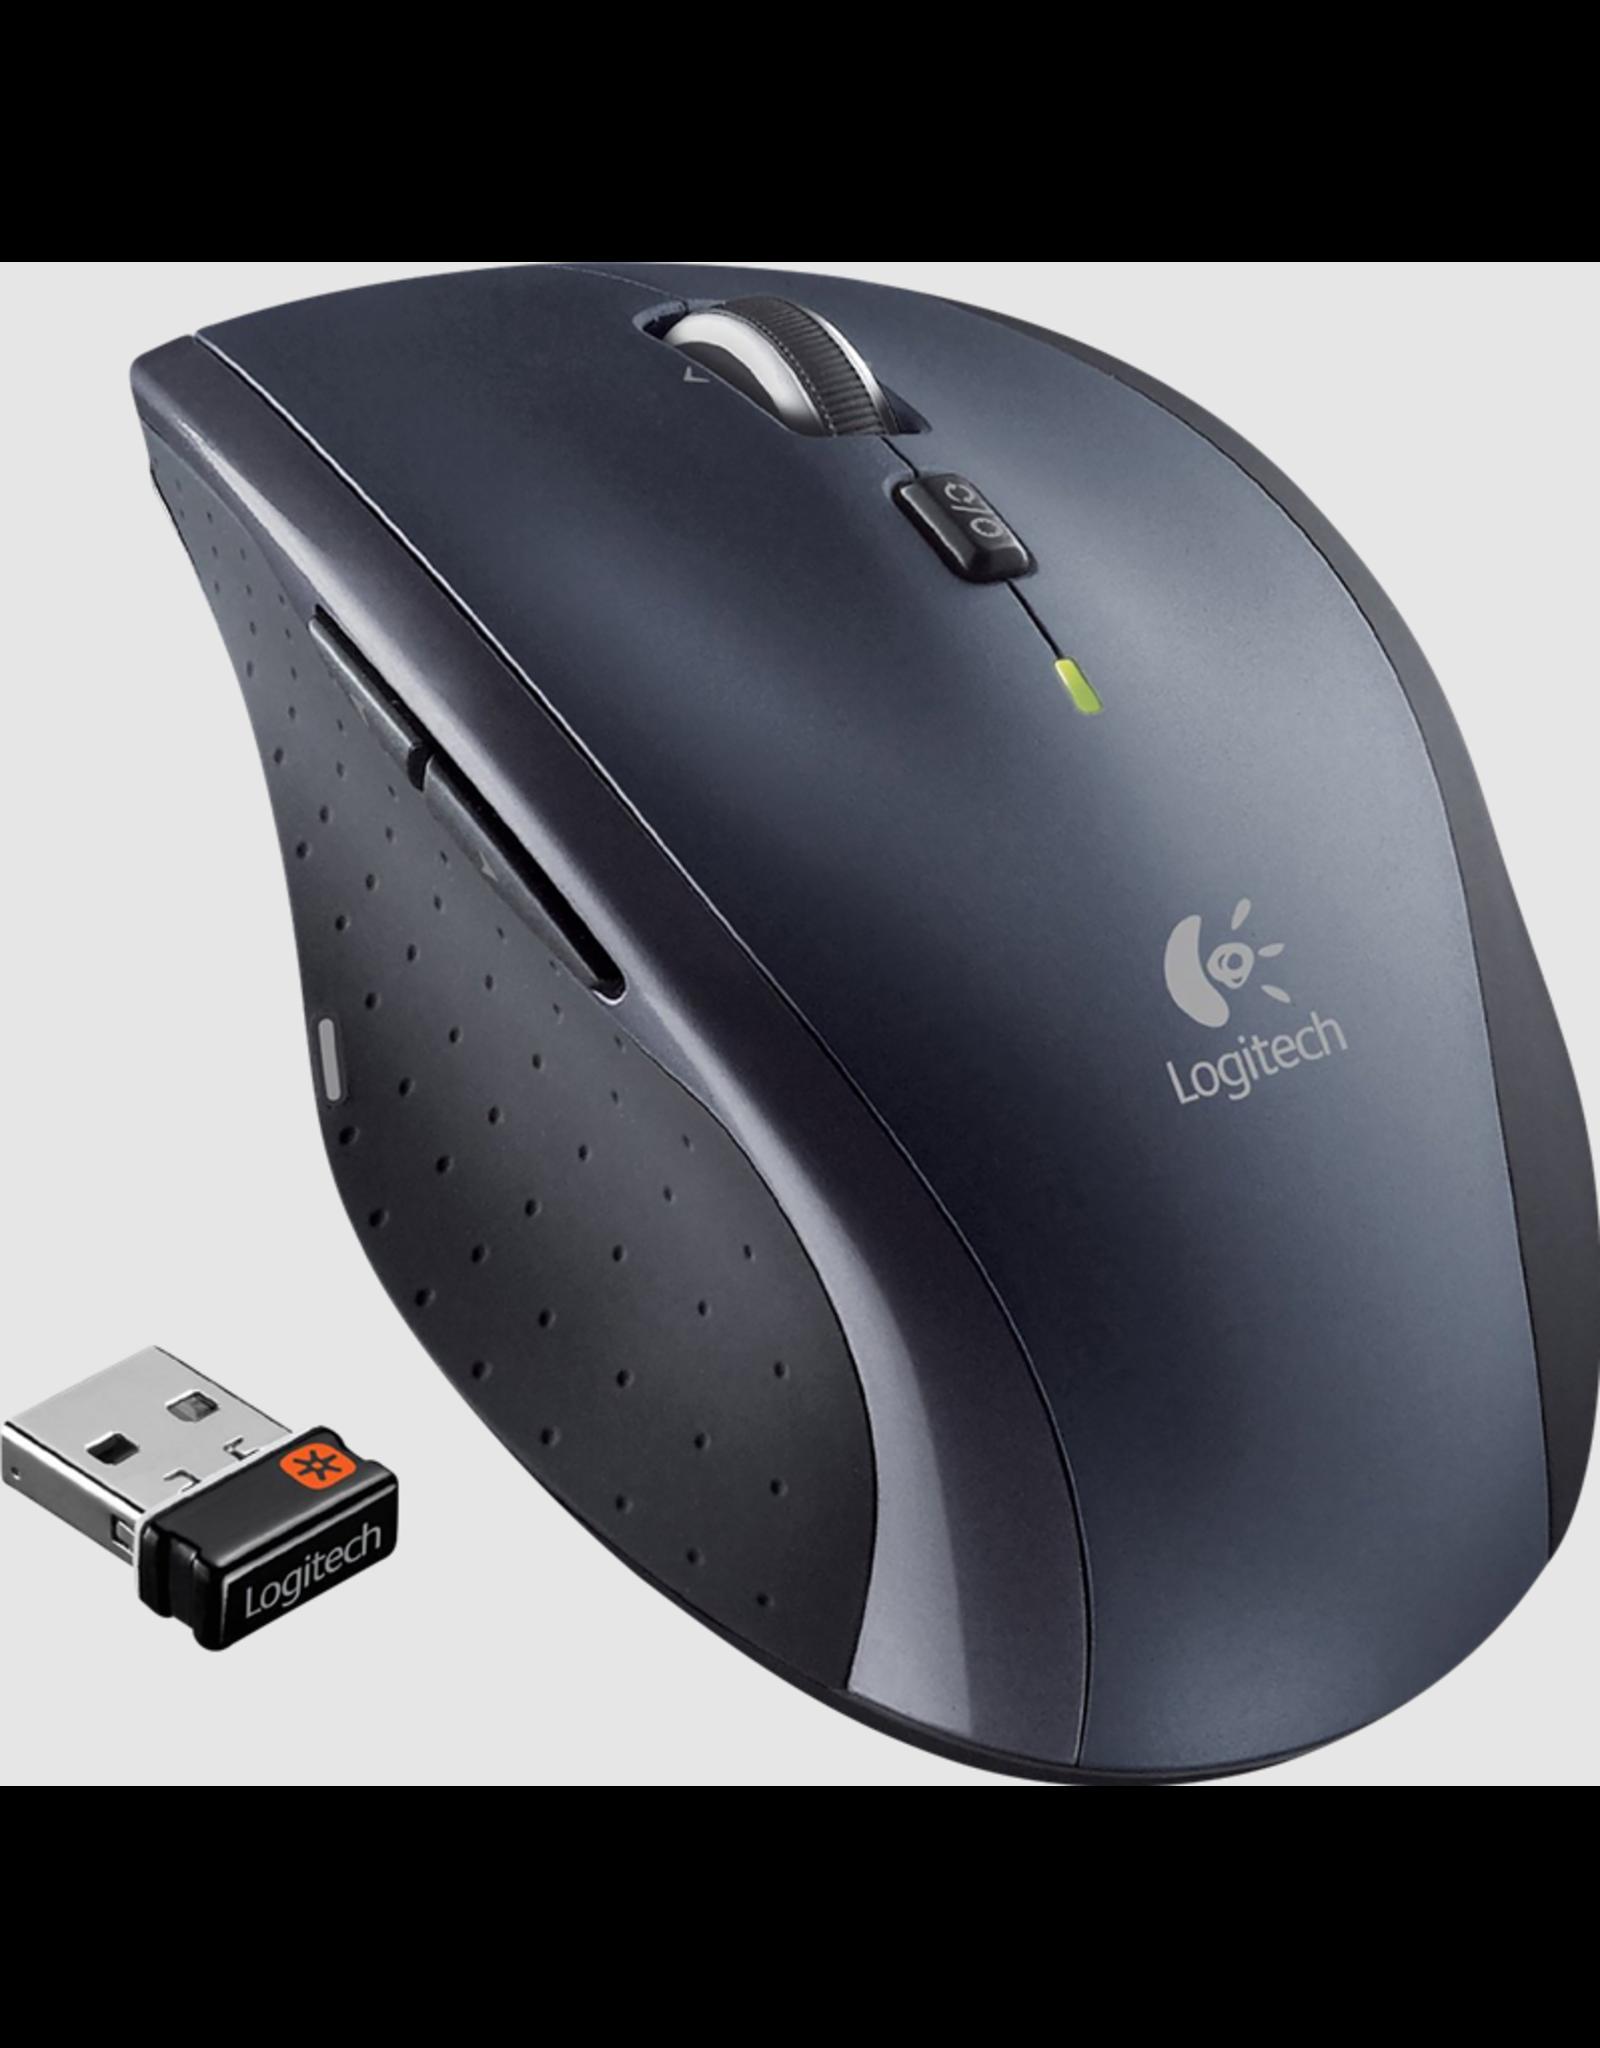 Logitech M705  Wireless Sculpted Mouse